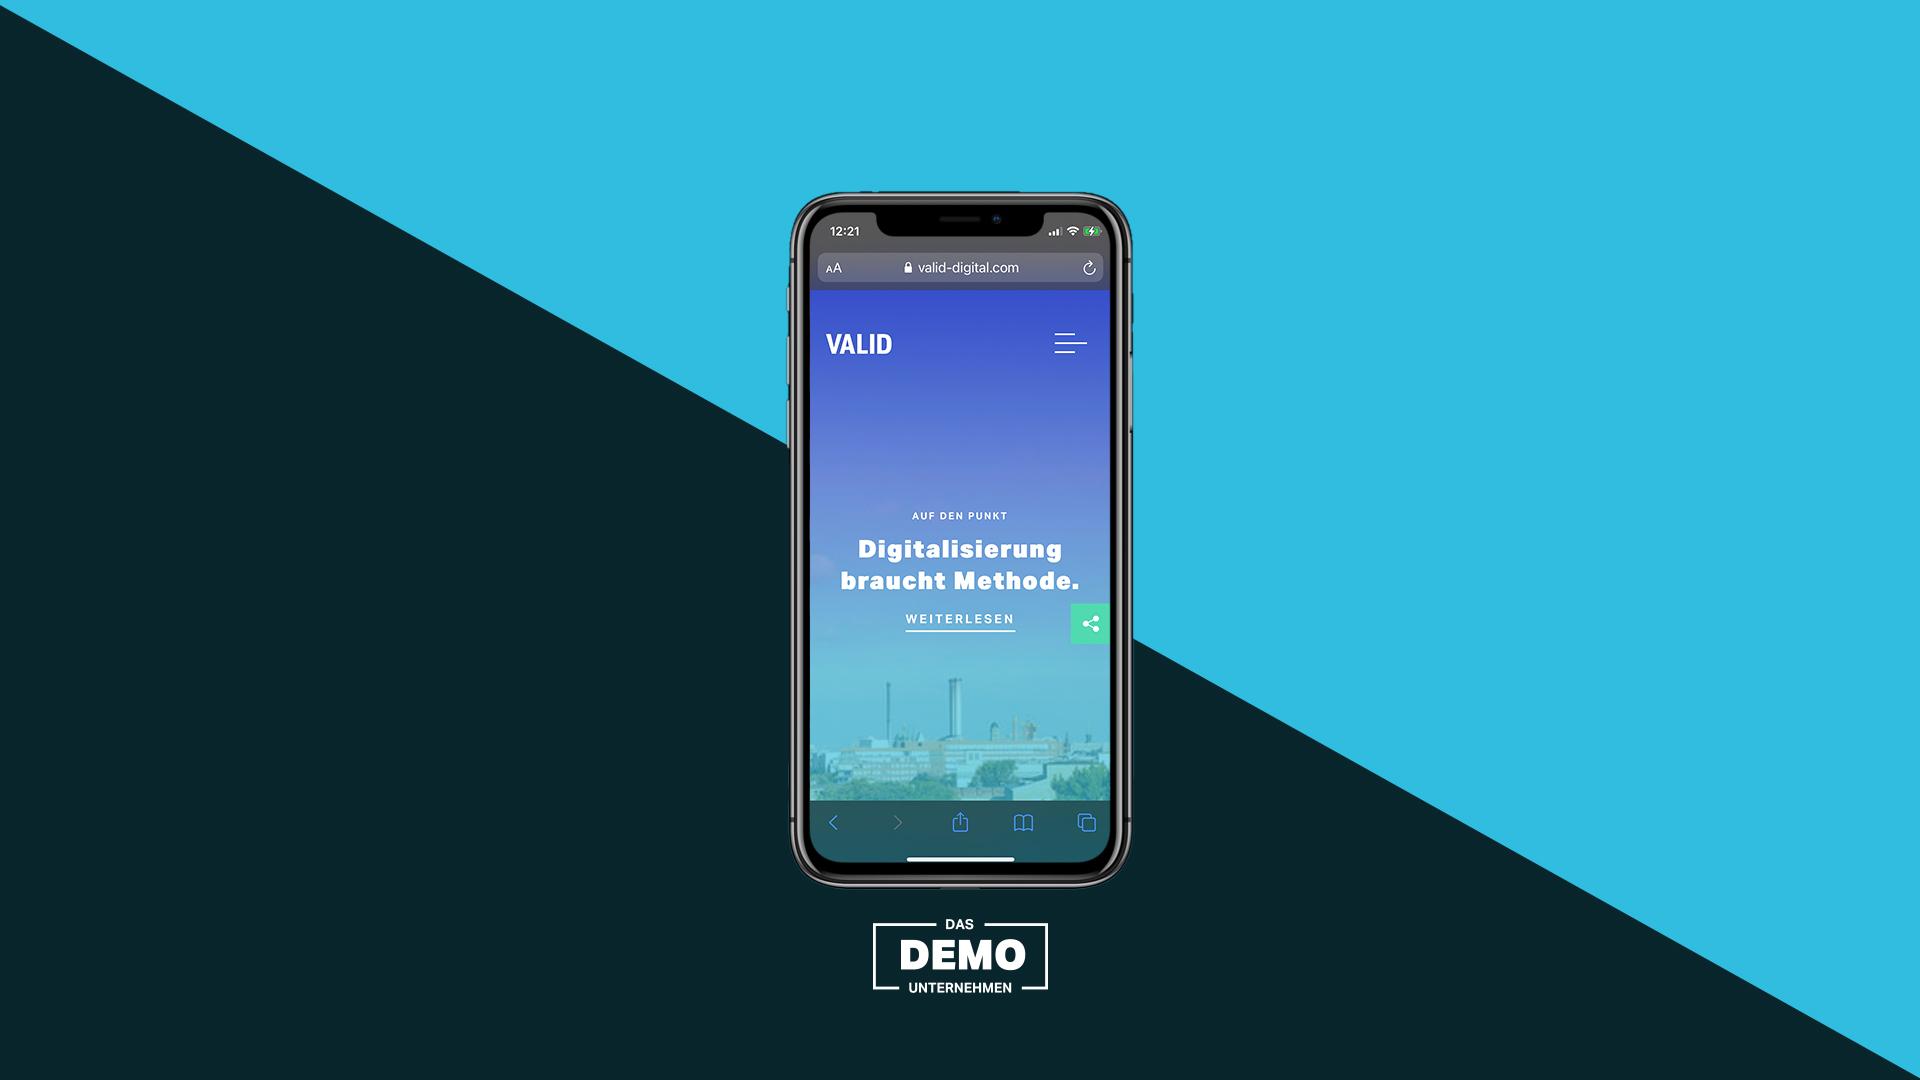 valid_demo/Templates/16-9/FeedBildV2.png